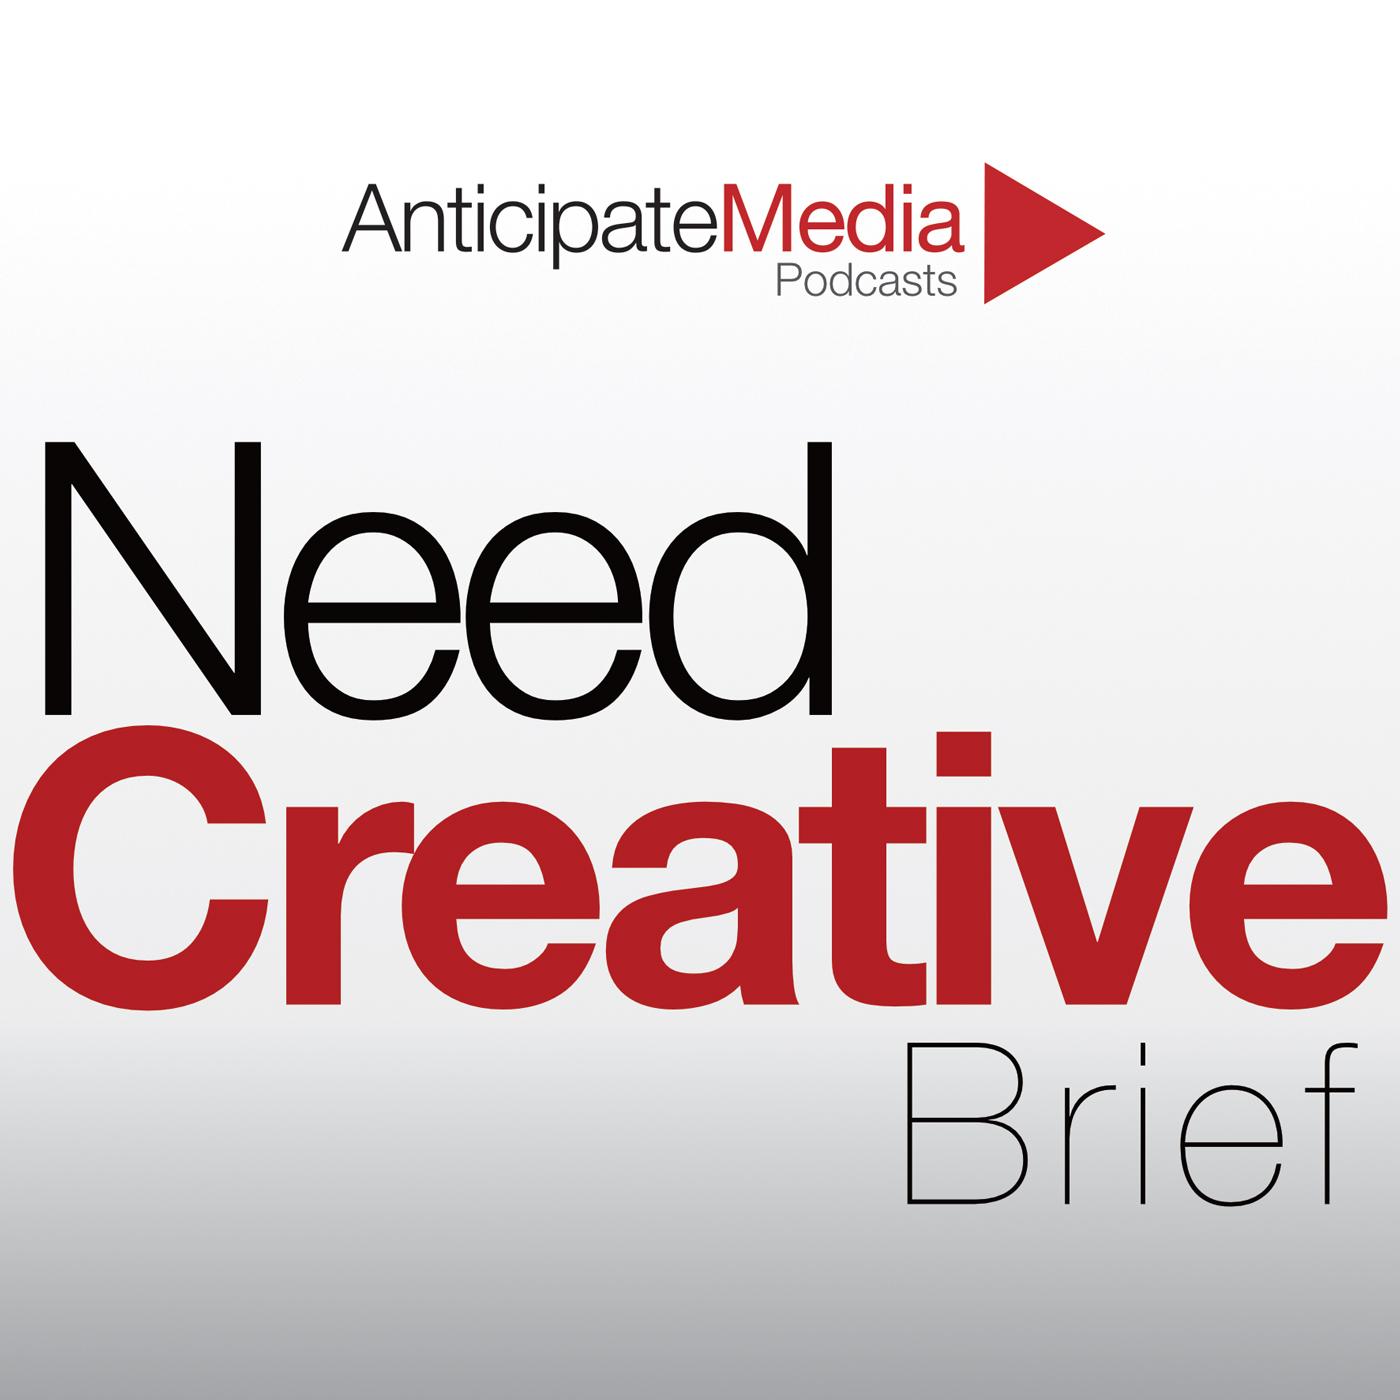 NeedCreative Brief Podcast - Anticipate Media